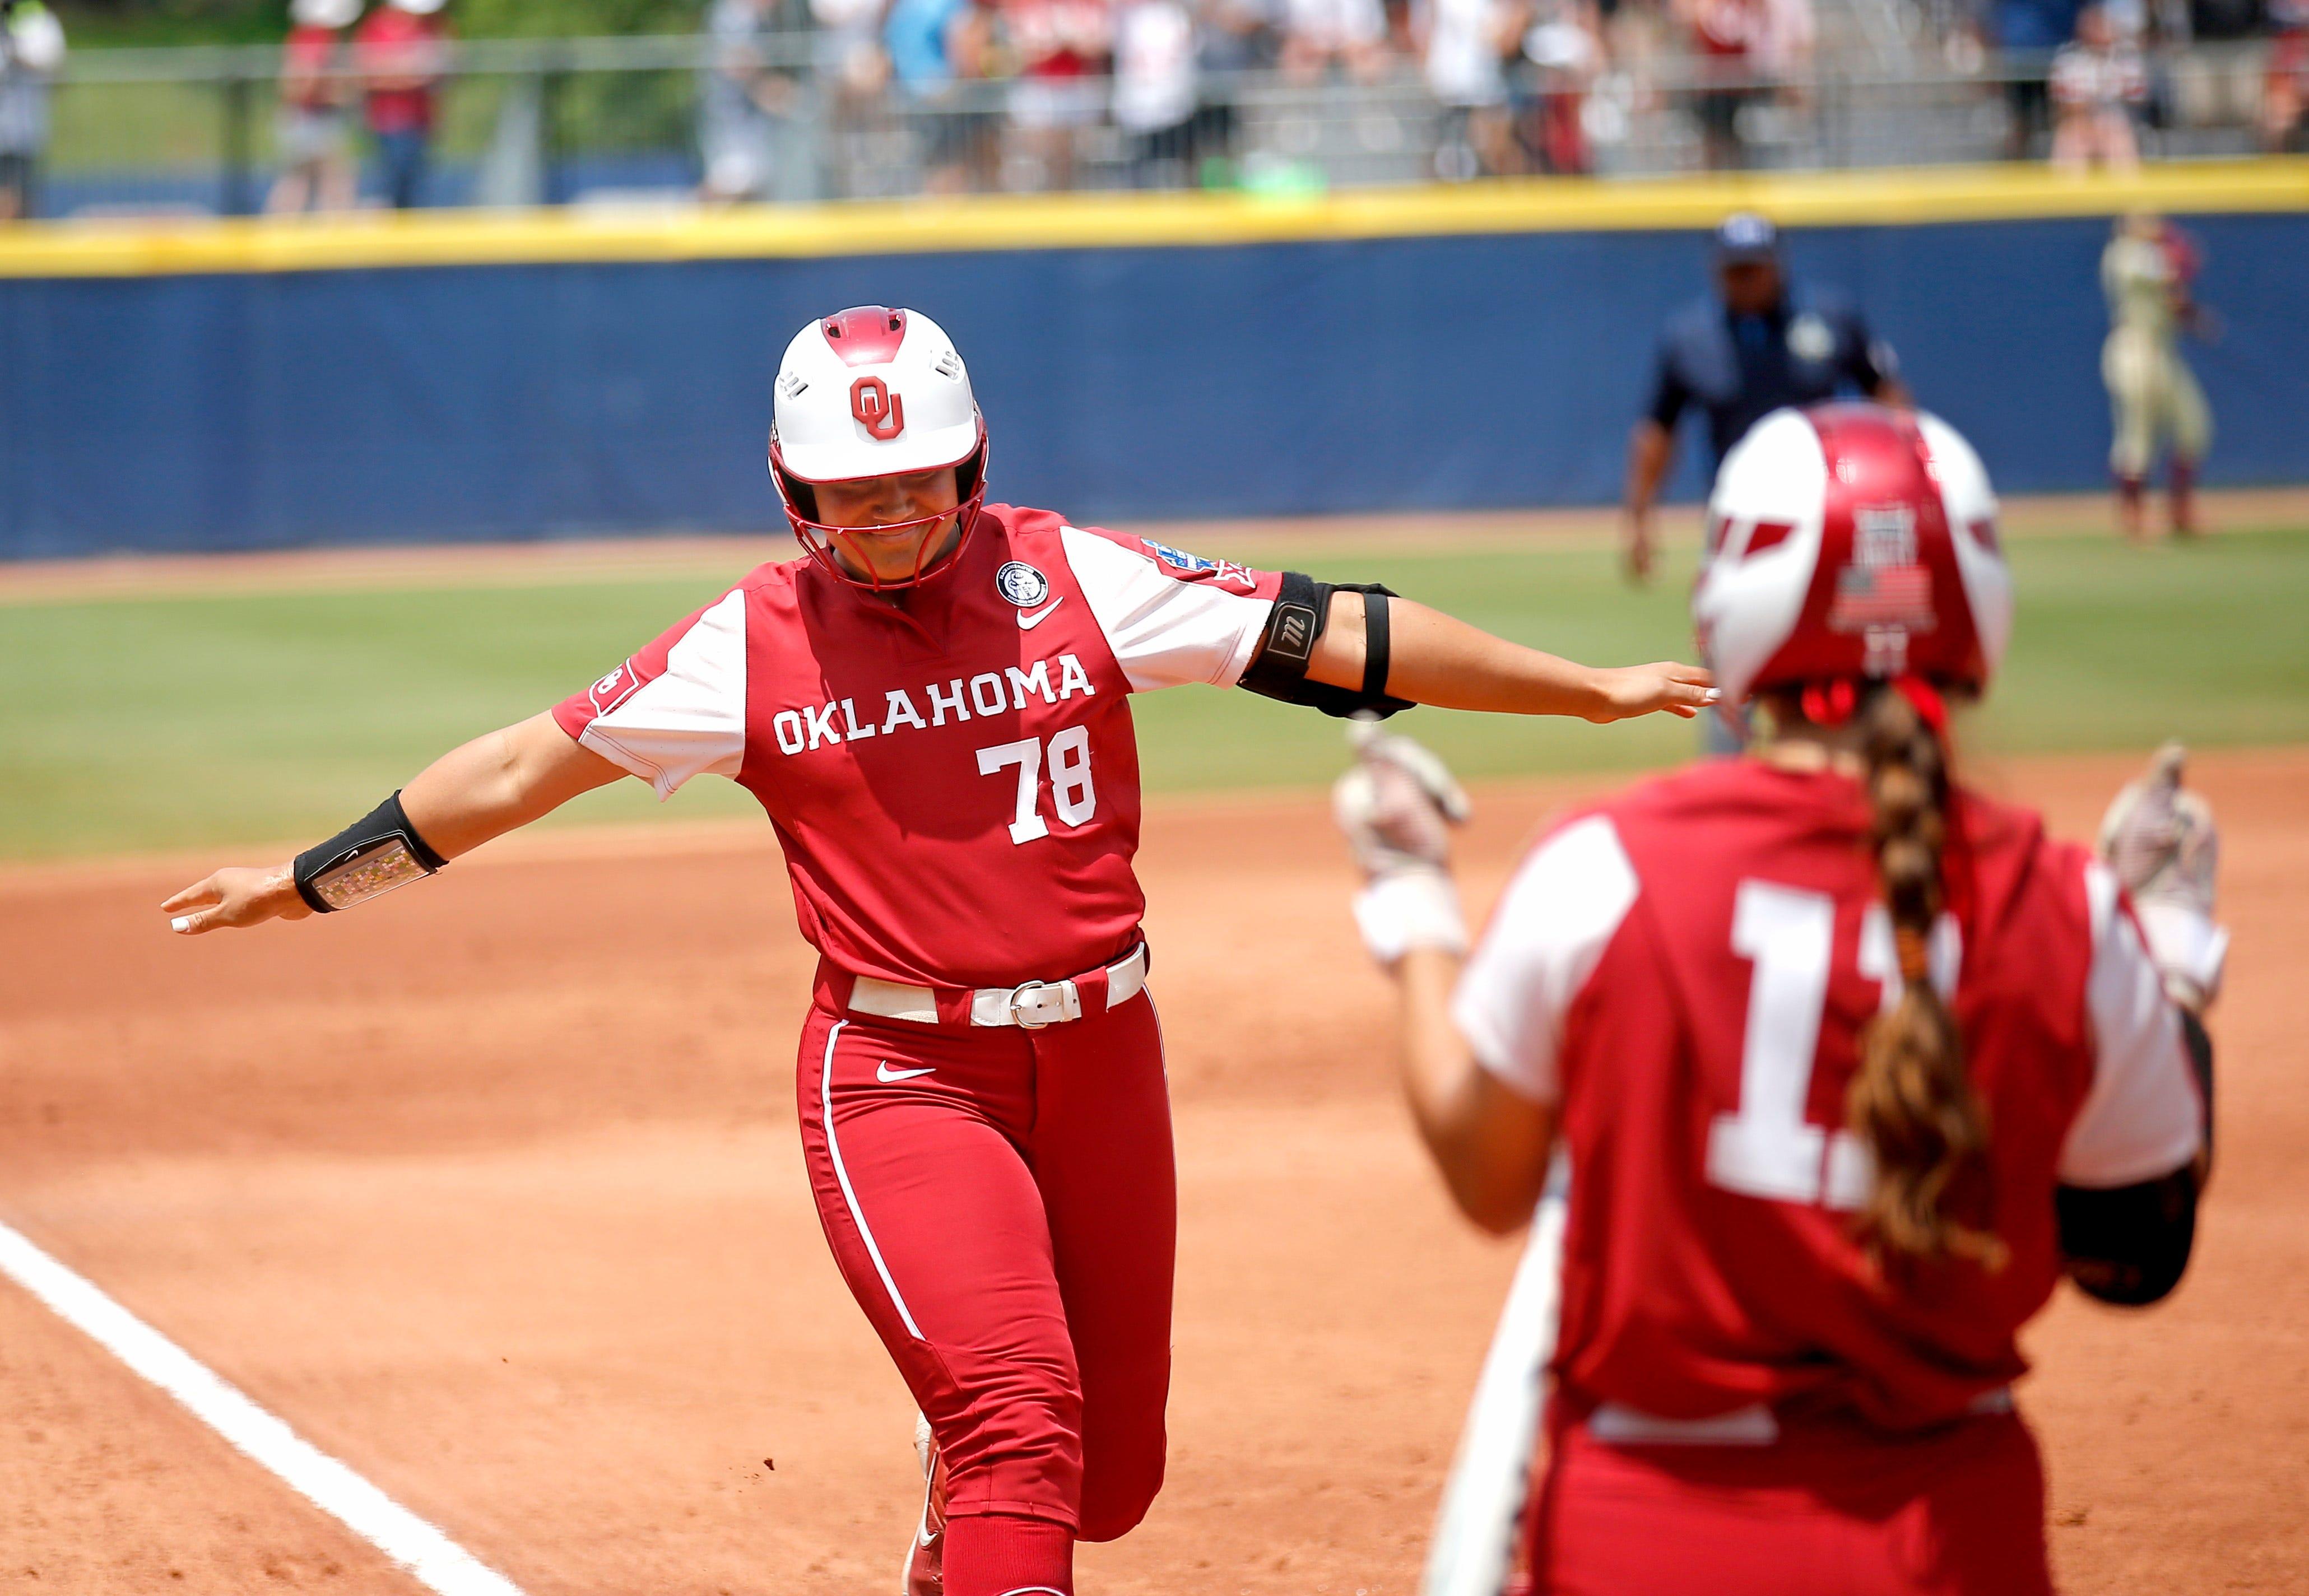 Oklahoma beats Florida State to win Women's College World Series championship